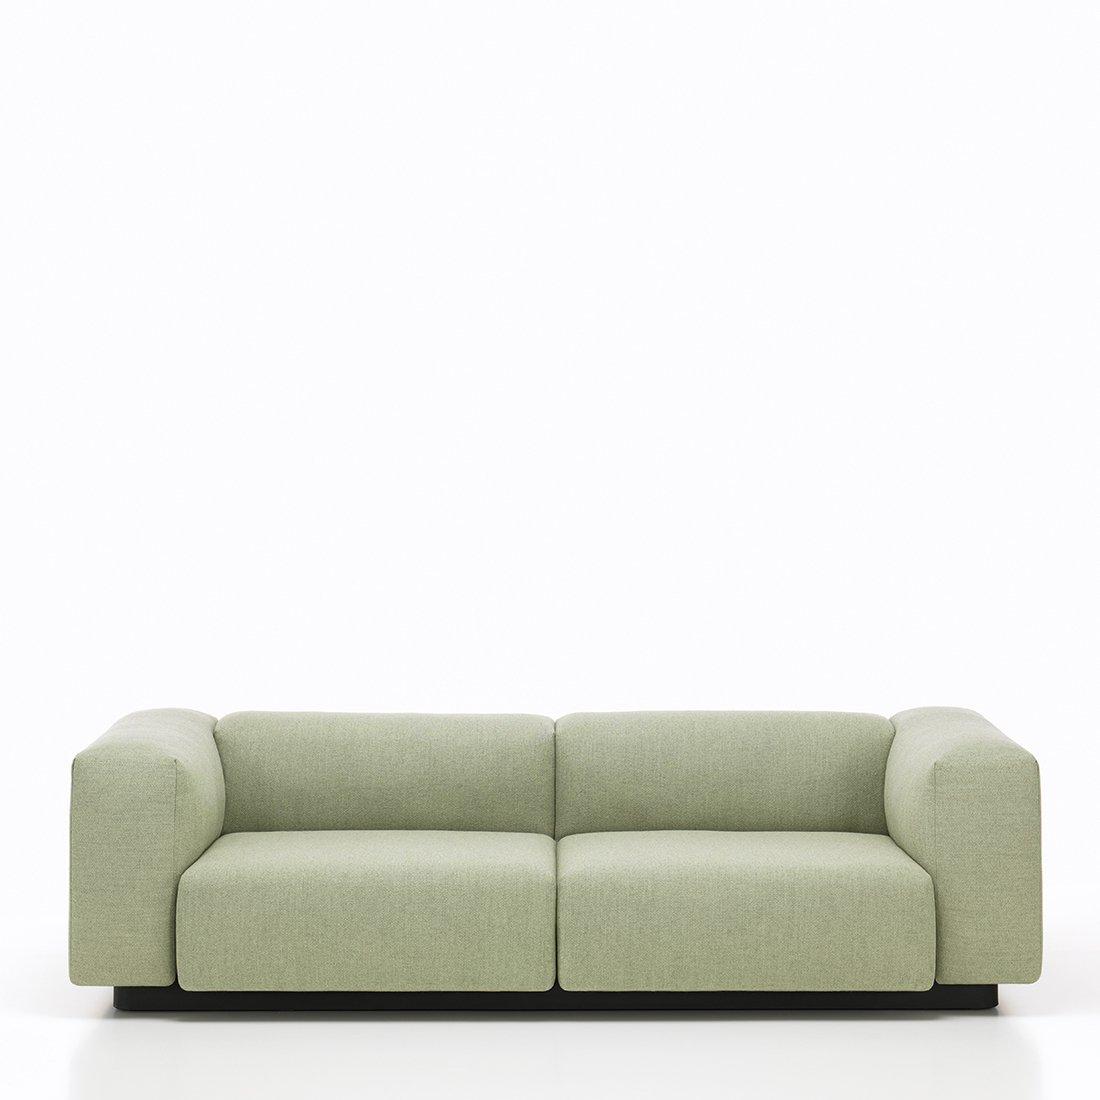 Vitra Soft Modular Sofa 2-zits Bank Offerte